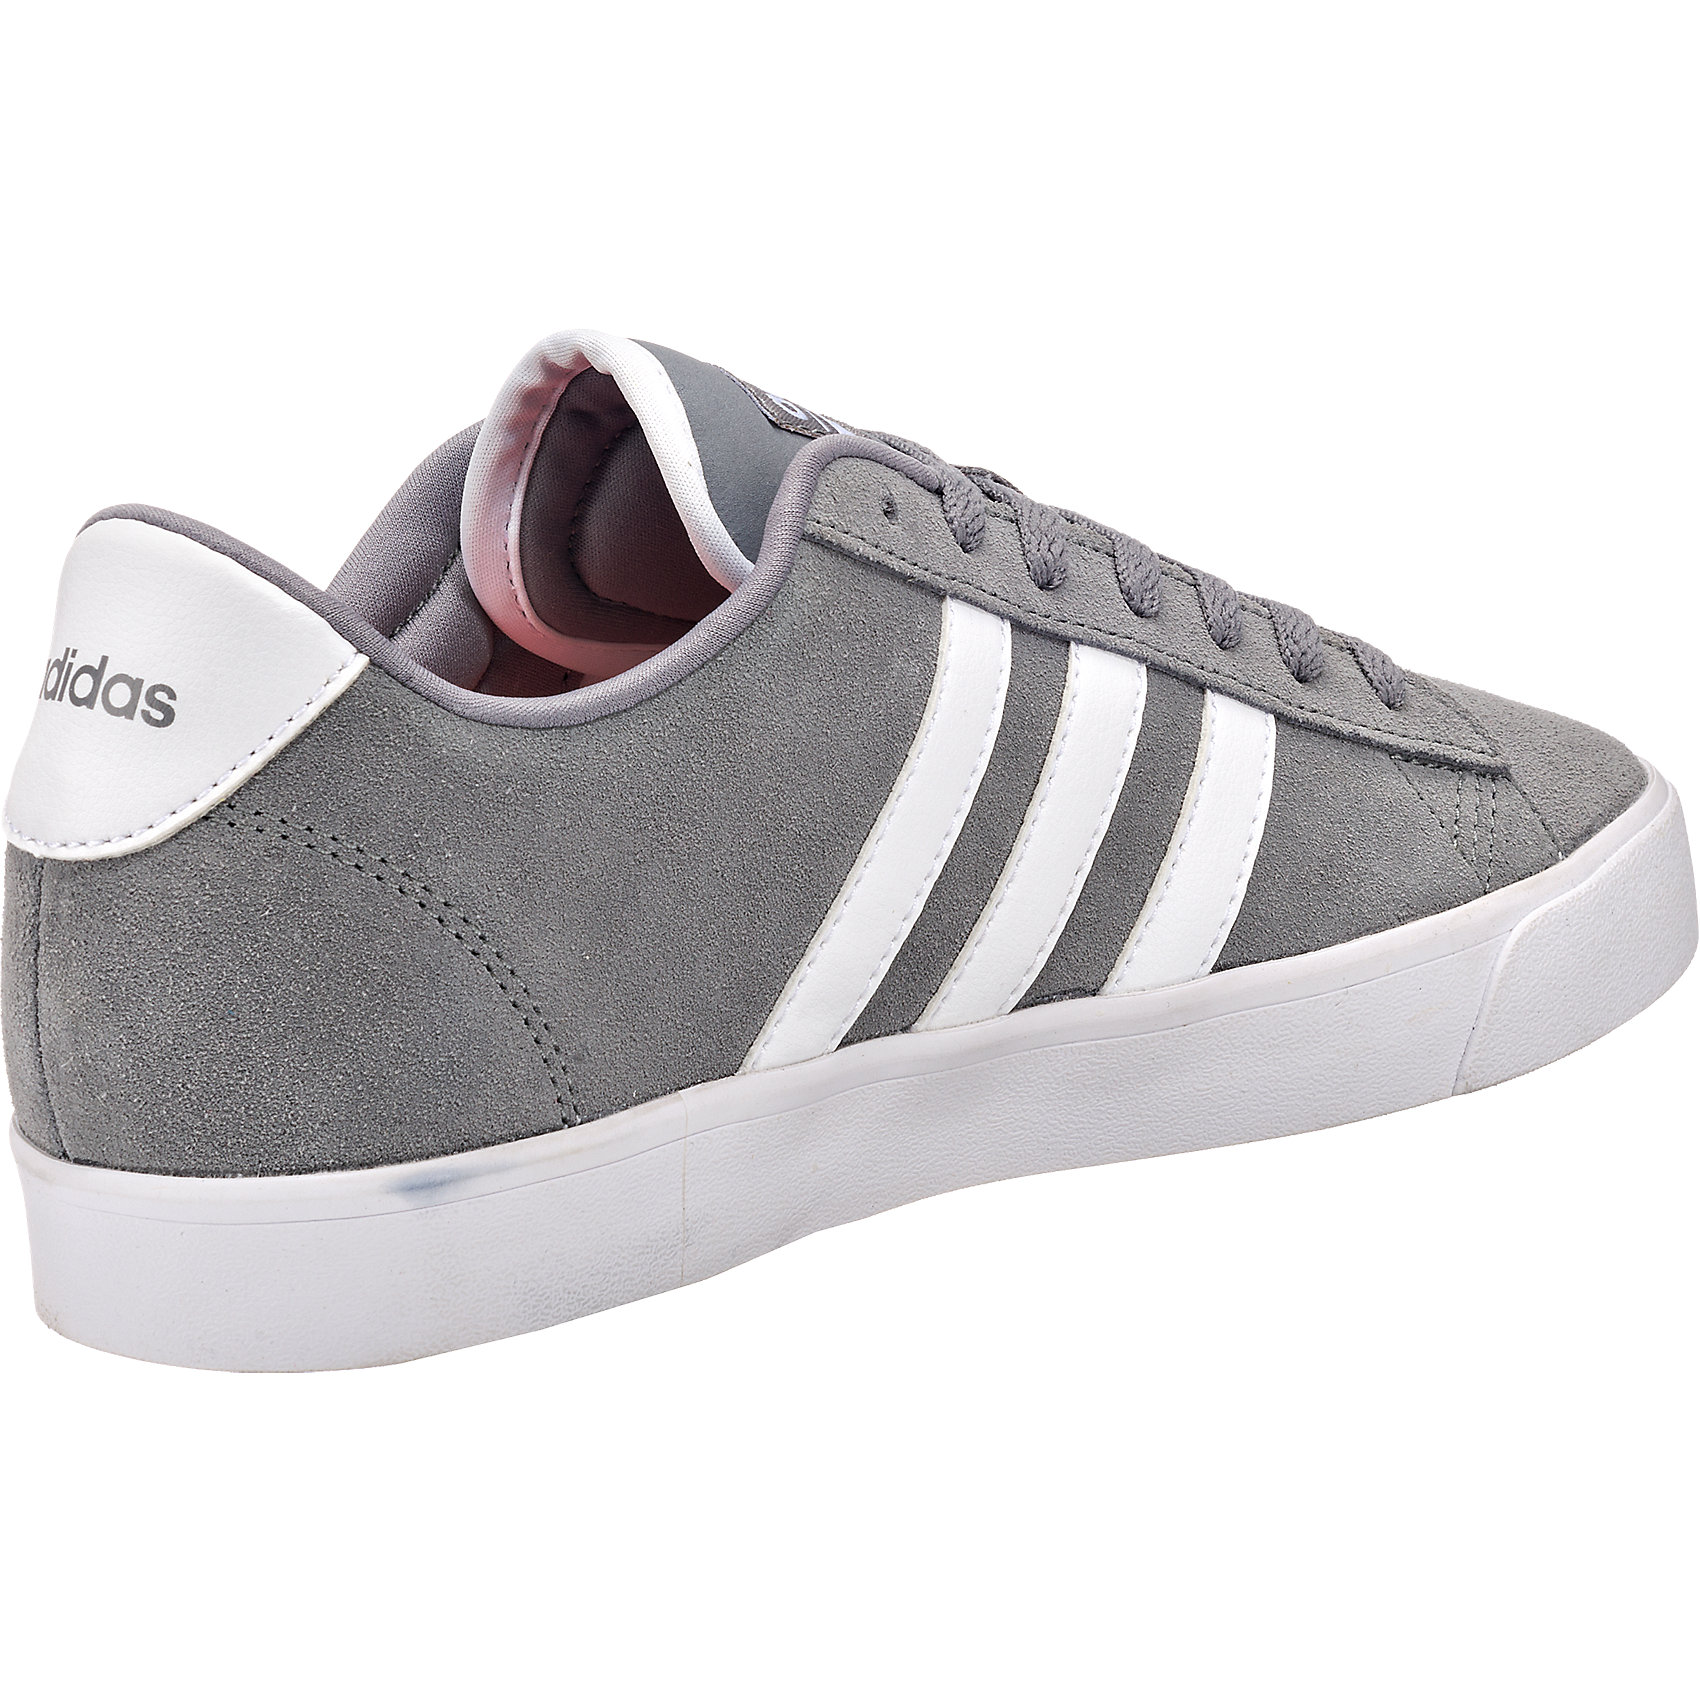 Neu adidas Sport Inspired adidas NEO Cf Daily Qt Sneakers 5778512 f r Damen